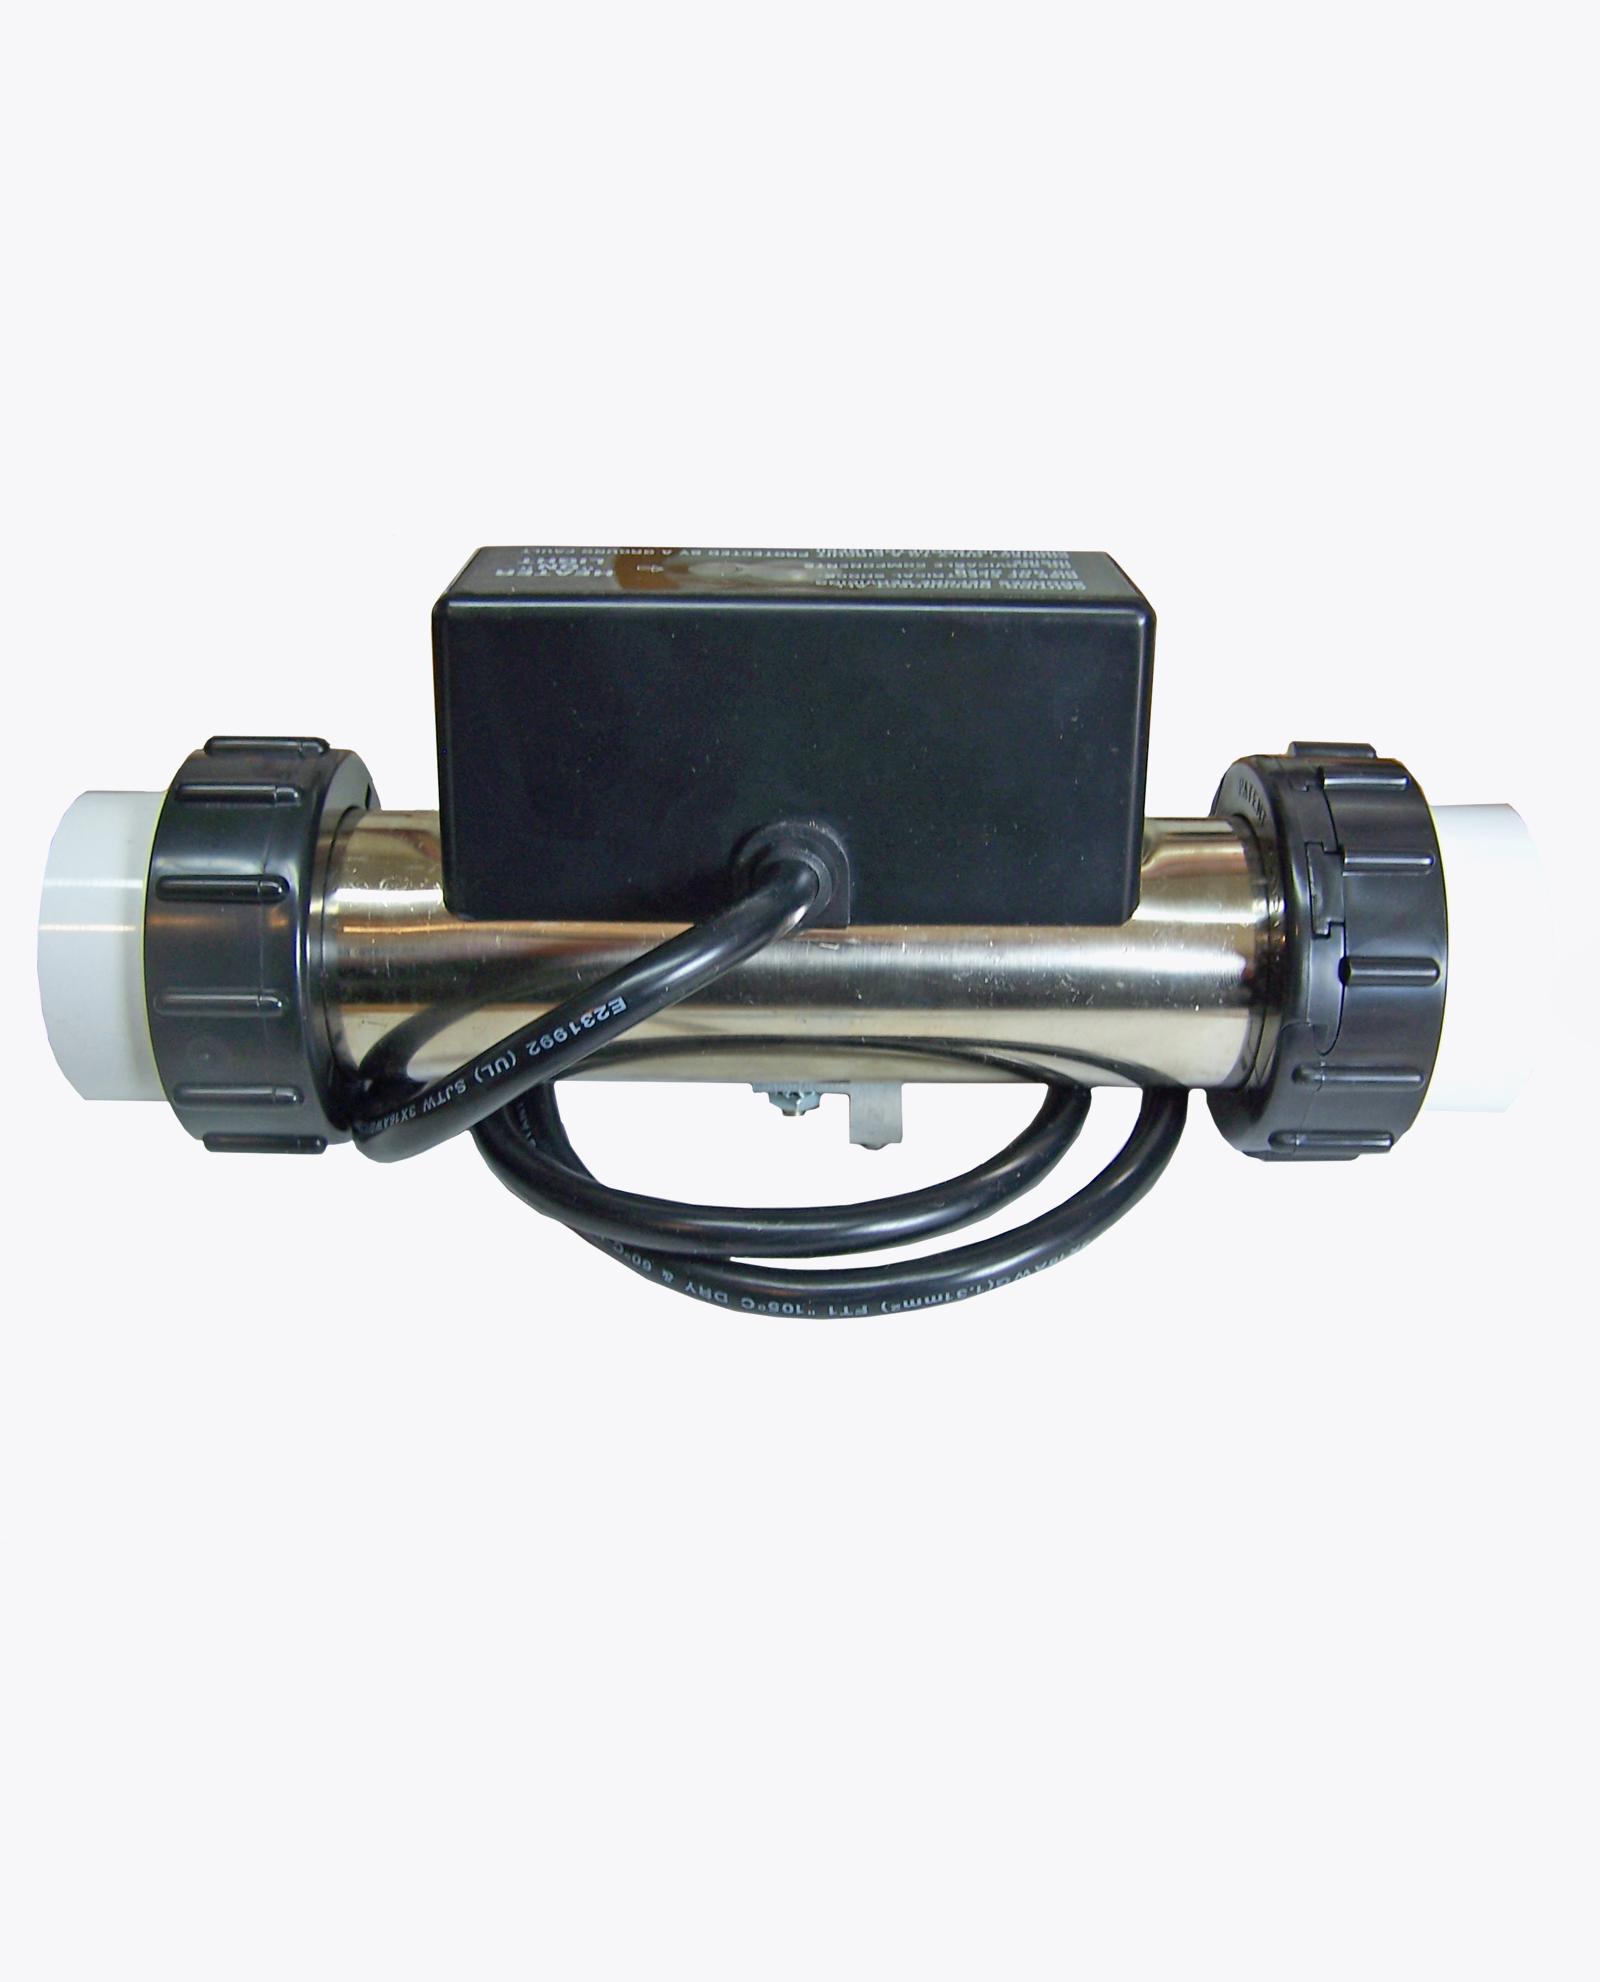 Whirlpool Bathtub Jet Pump Amp Heat Master Inline Heater